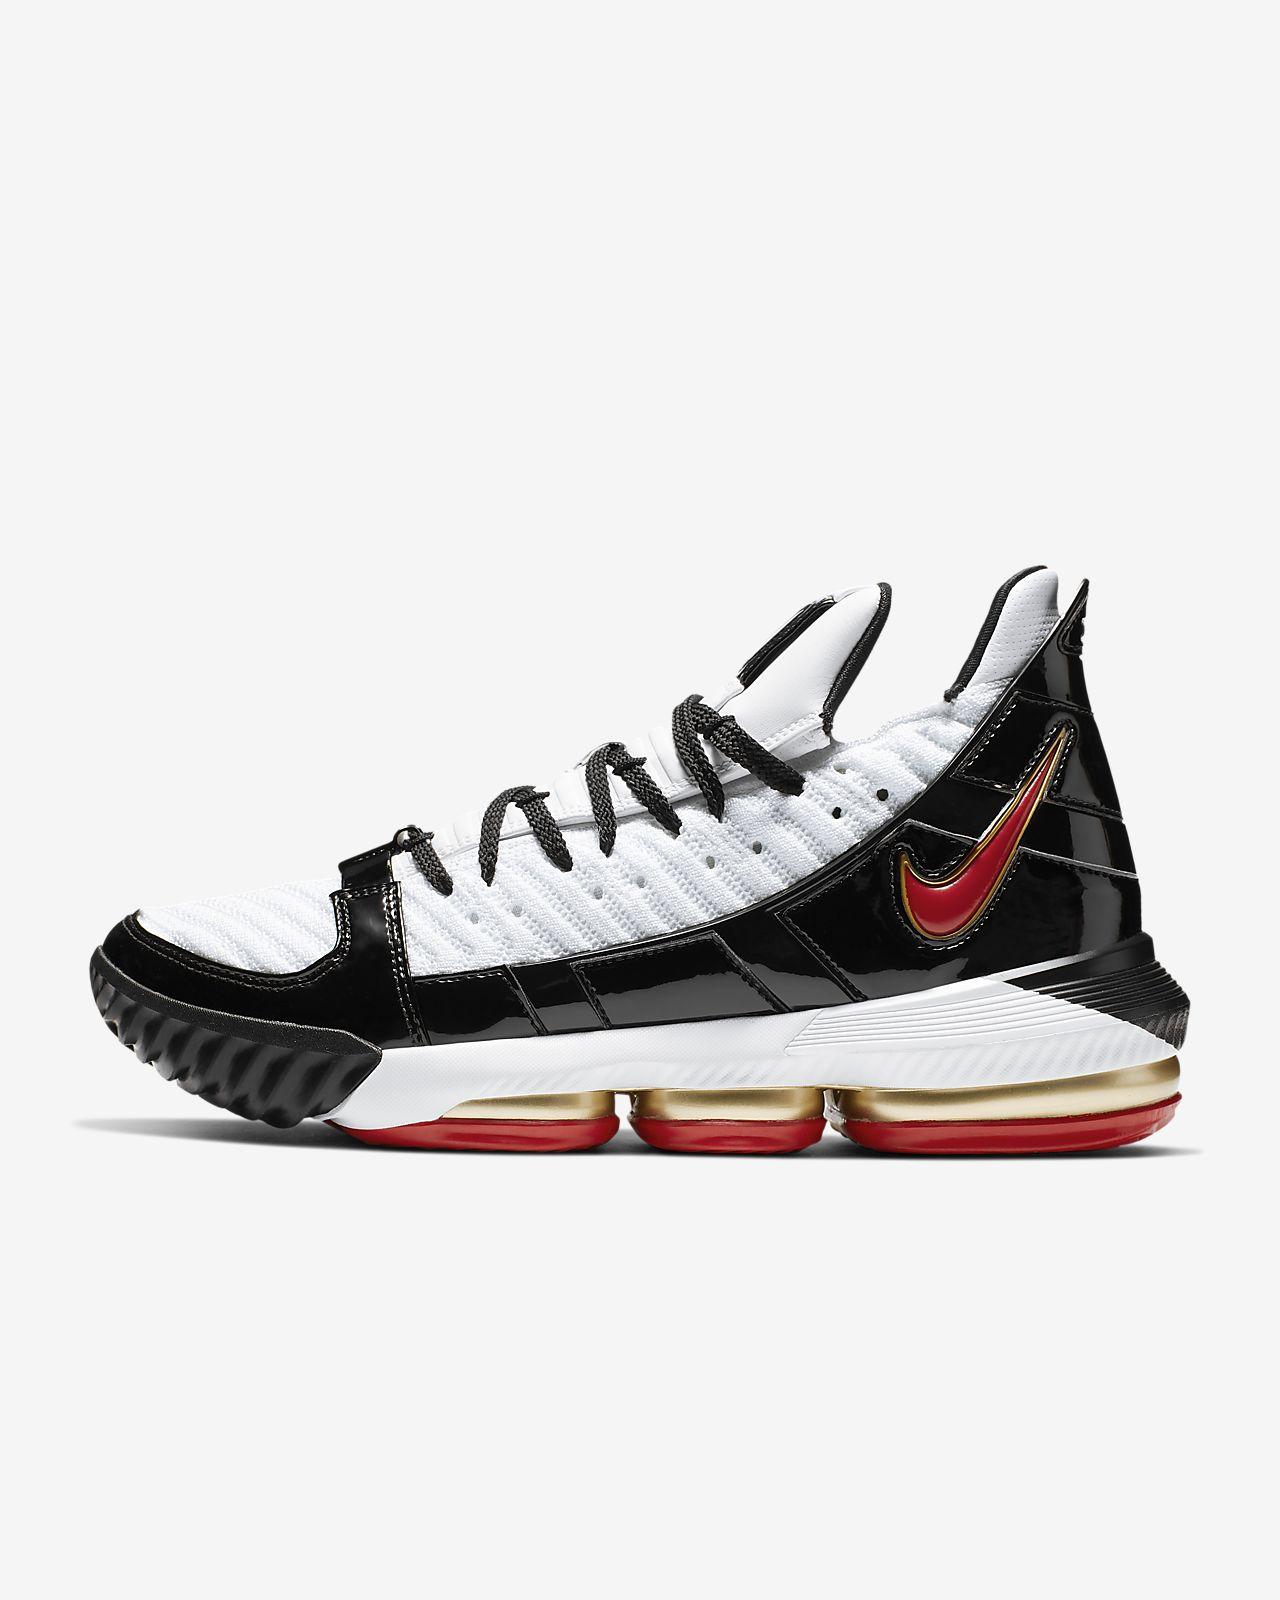 Chaussure de basketball LeBron XVI Remix